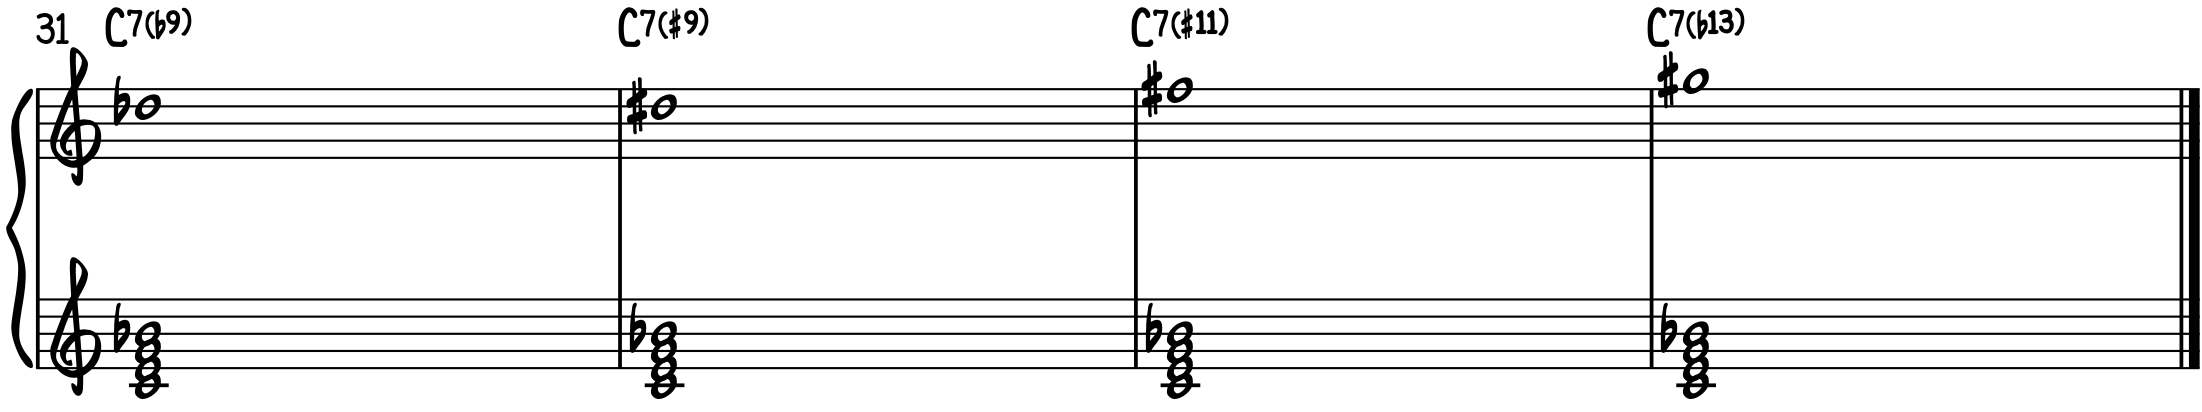 Altered Piano Chords Dominant C7(b9) C7(#9) C7(#11) C7(b13)